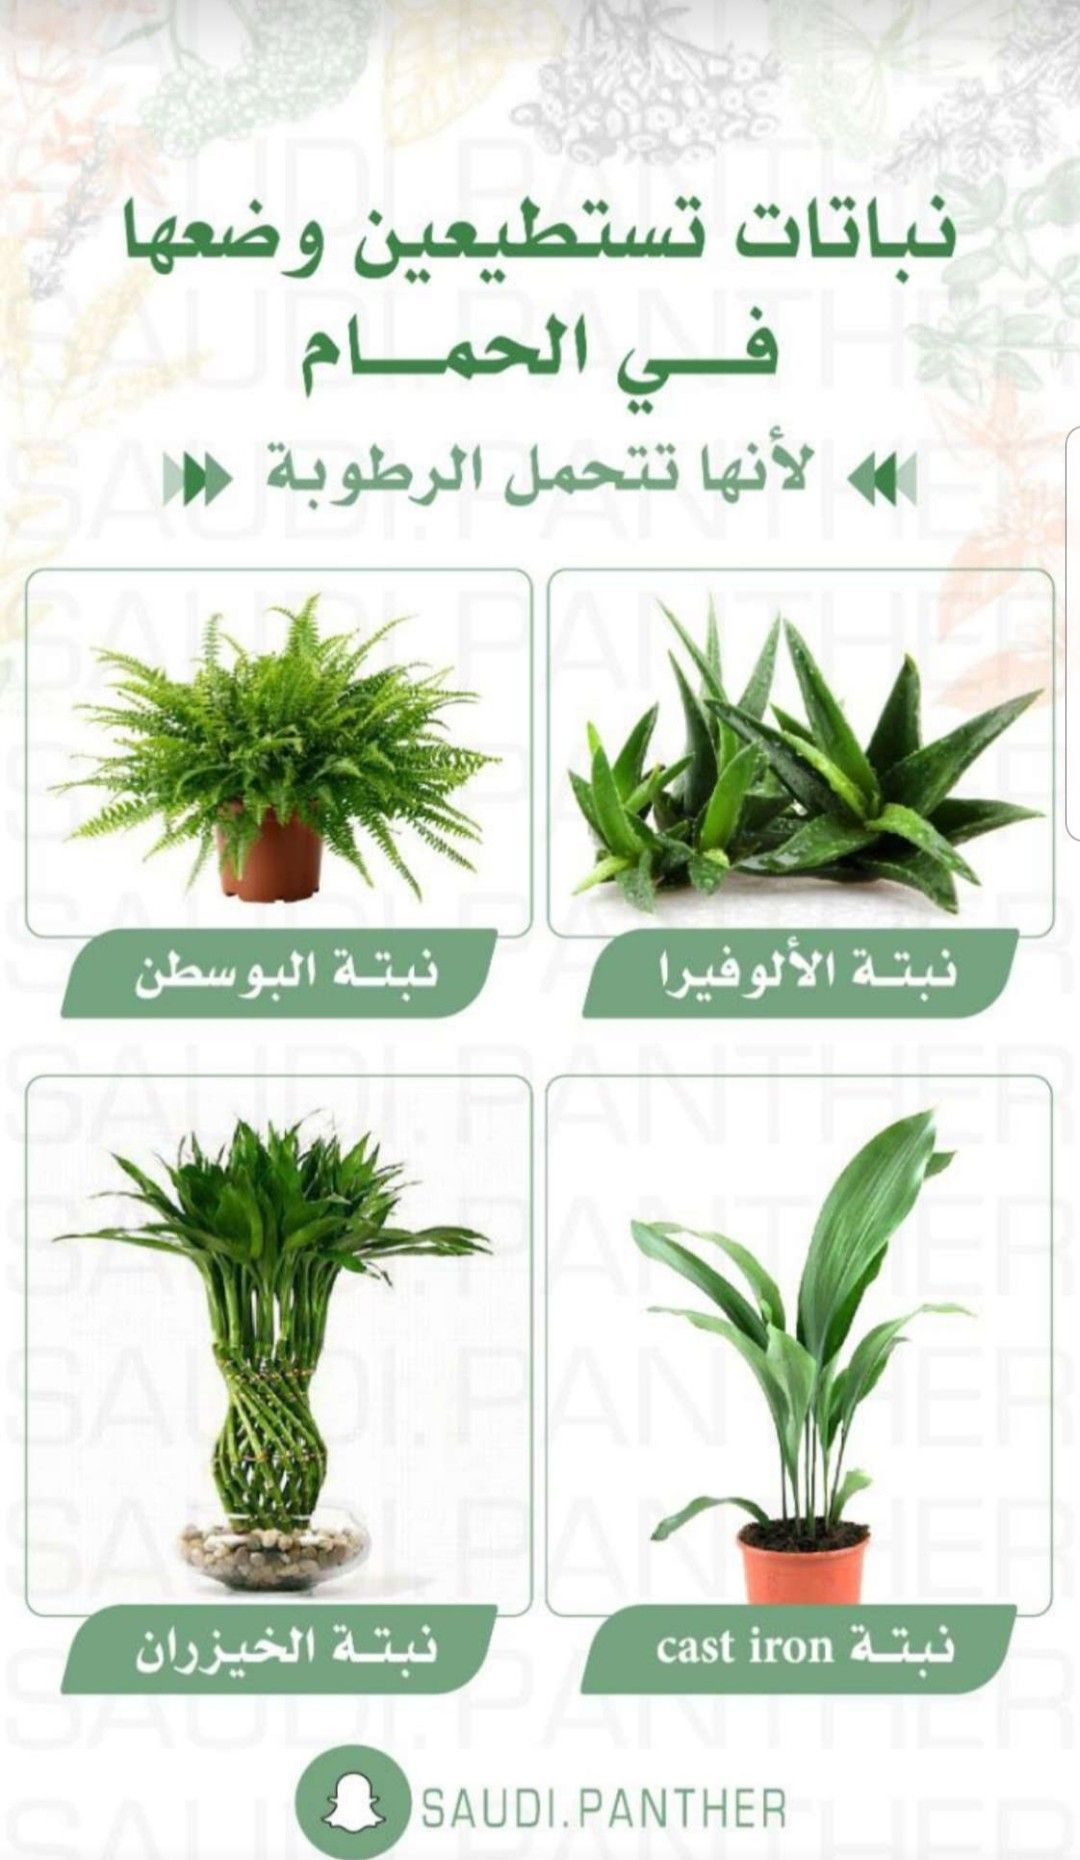 Pin By Hnoreen On Home Managment إدارة المنزل House Plants Decor Vegetable Garden Diy Plant Decor